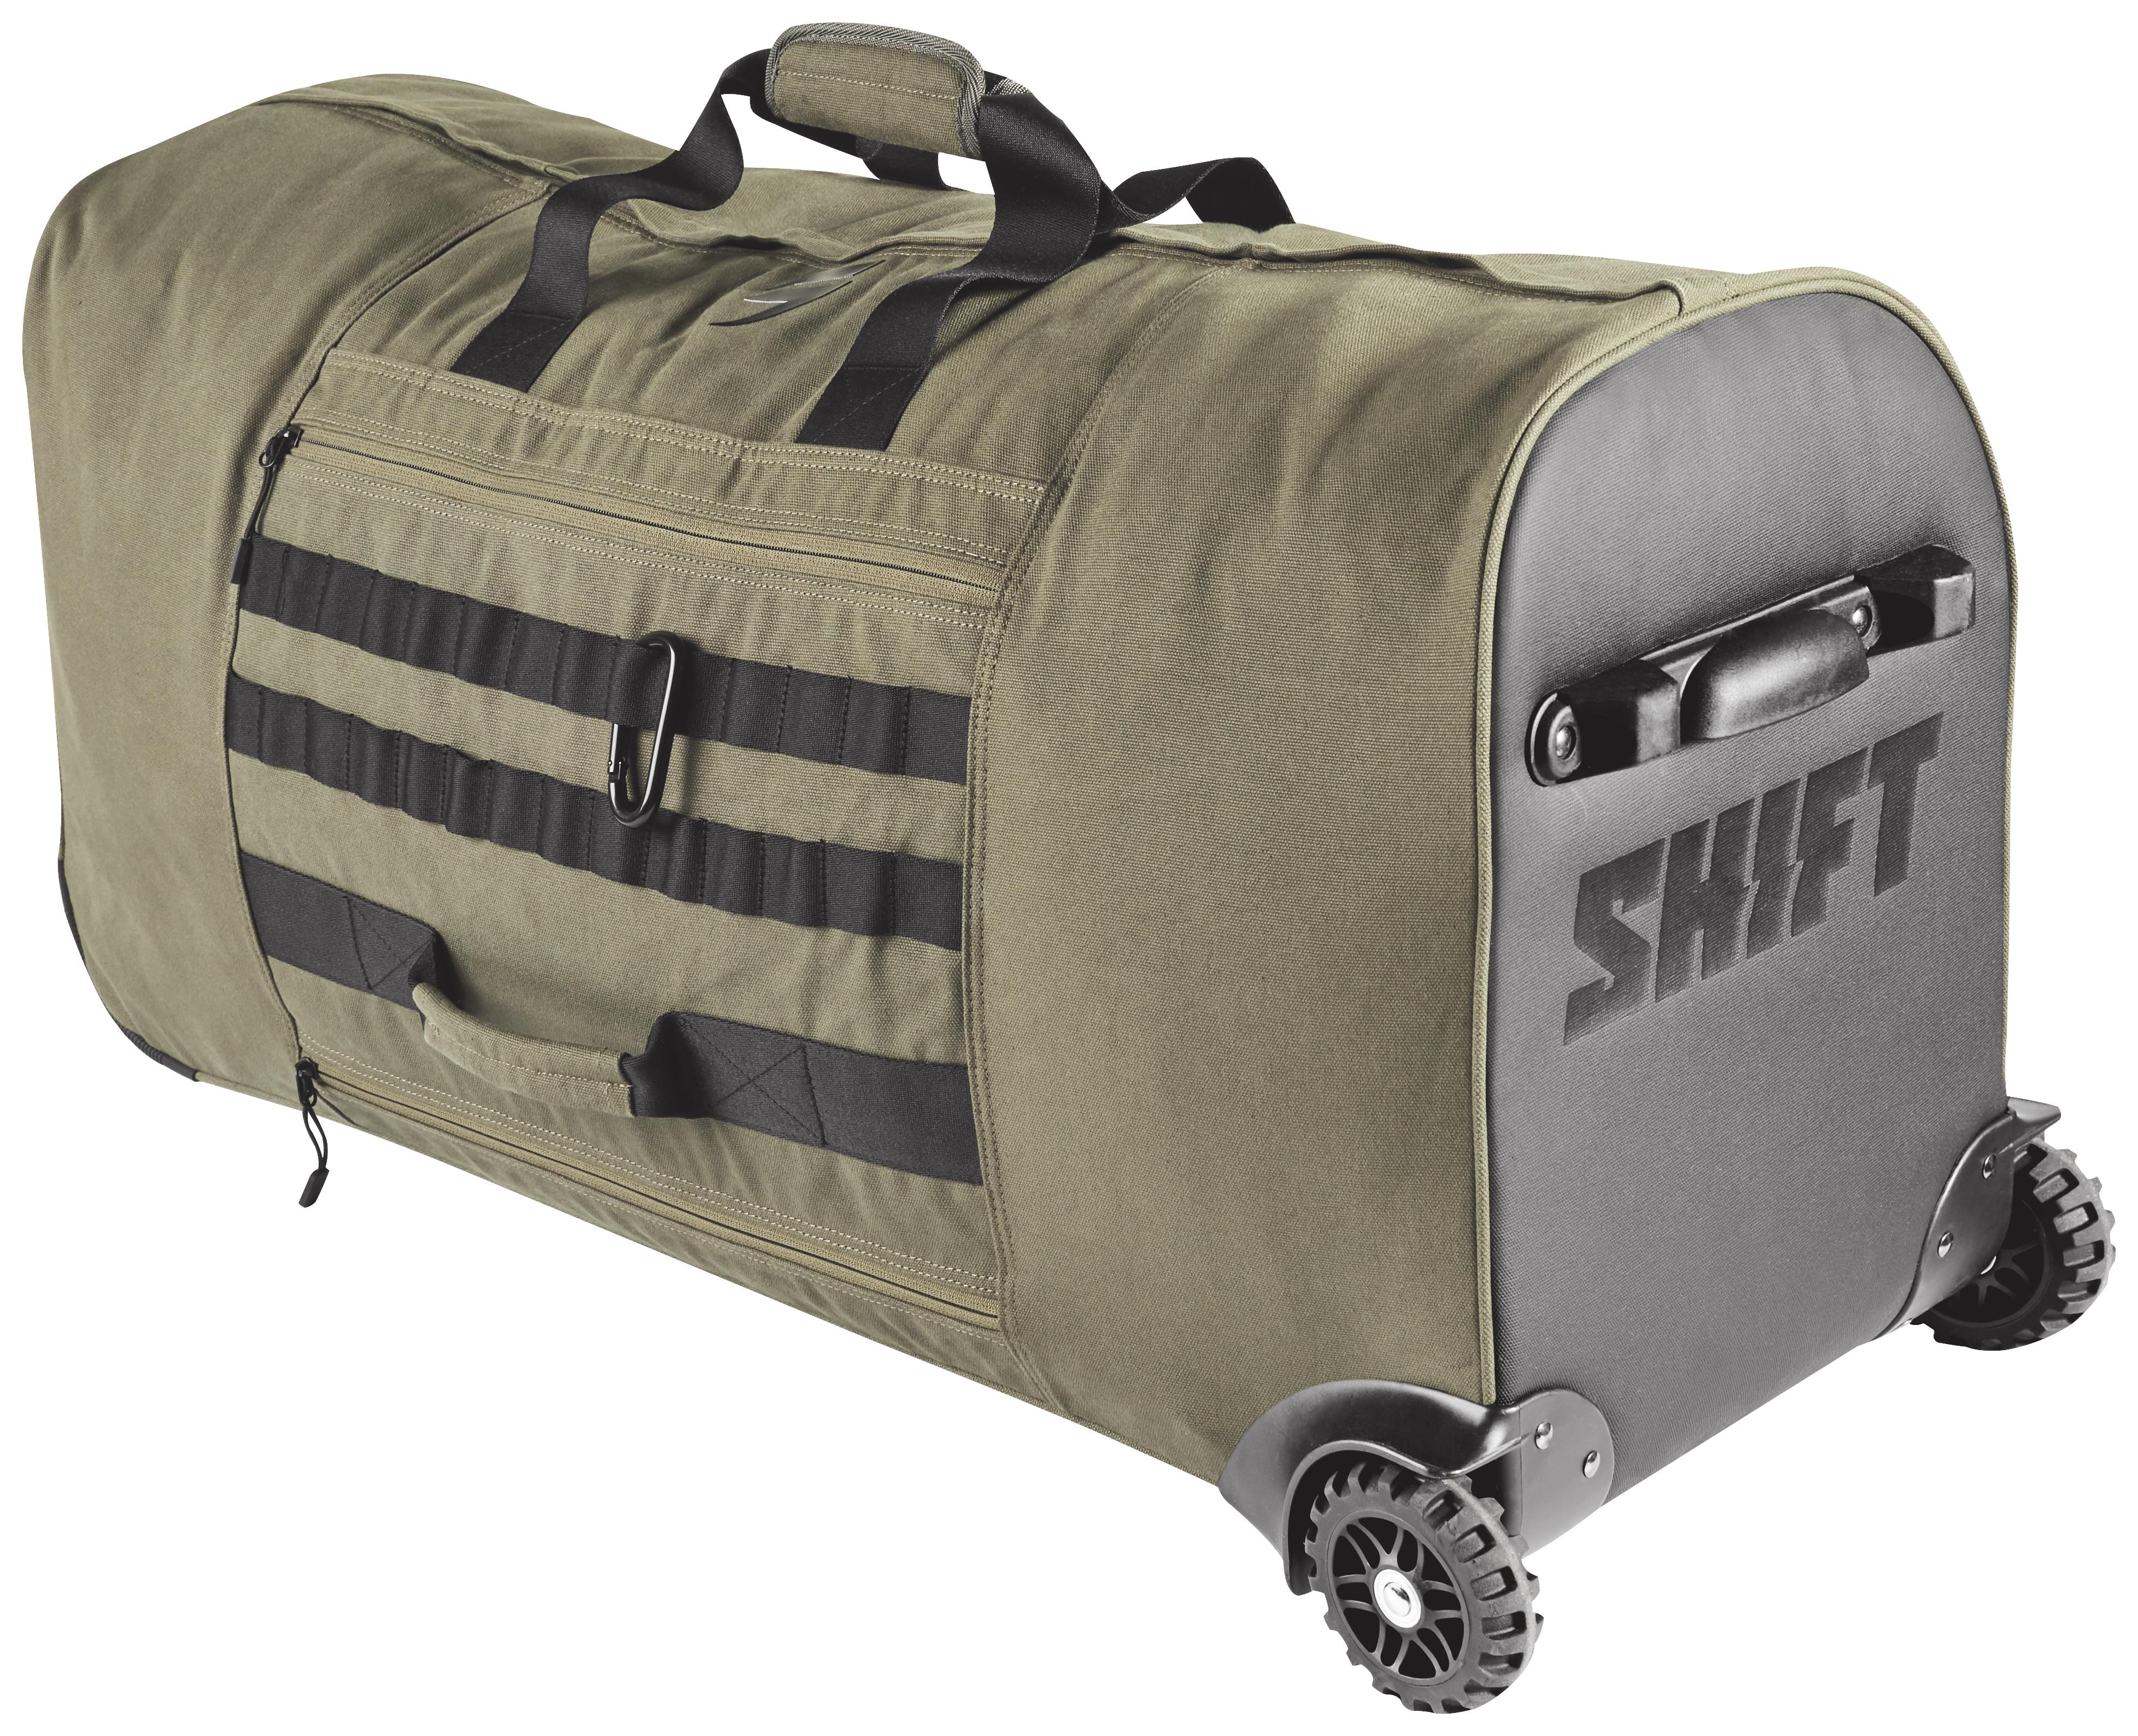 Shift Roller Bag - Cycle Gear 3a53fd7f106c0